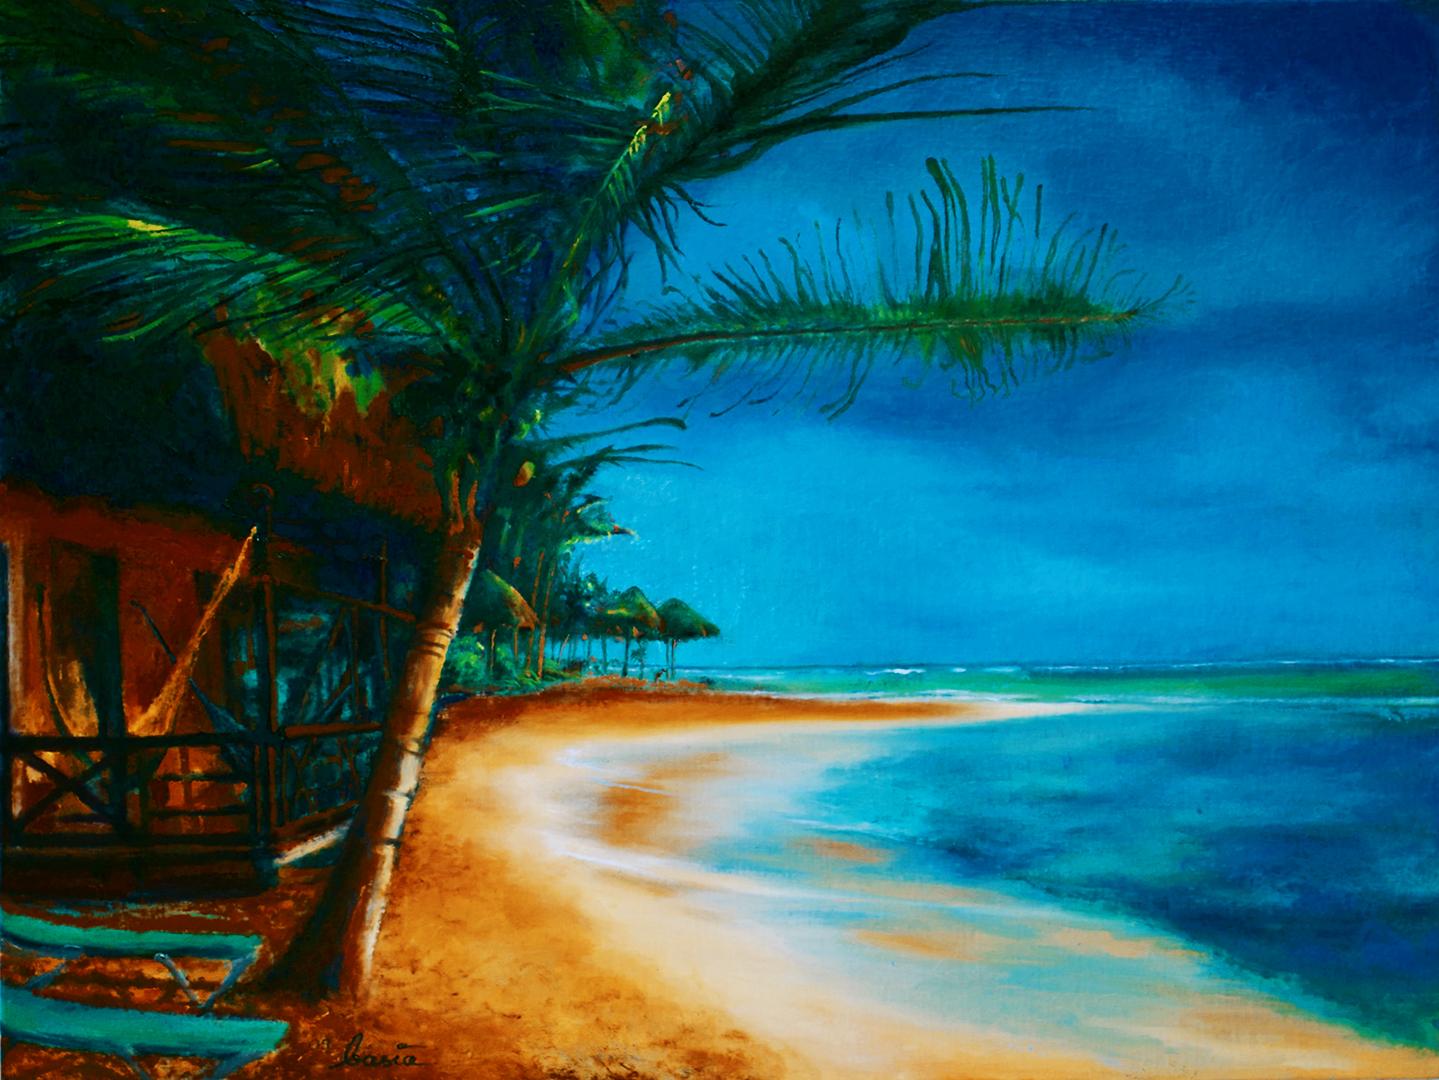 playa del carmen.jpg